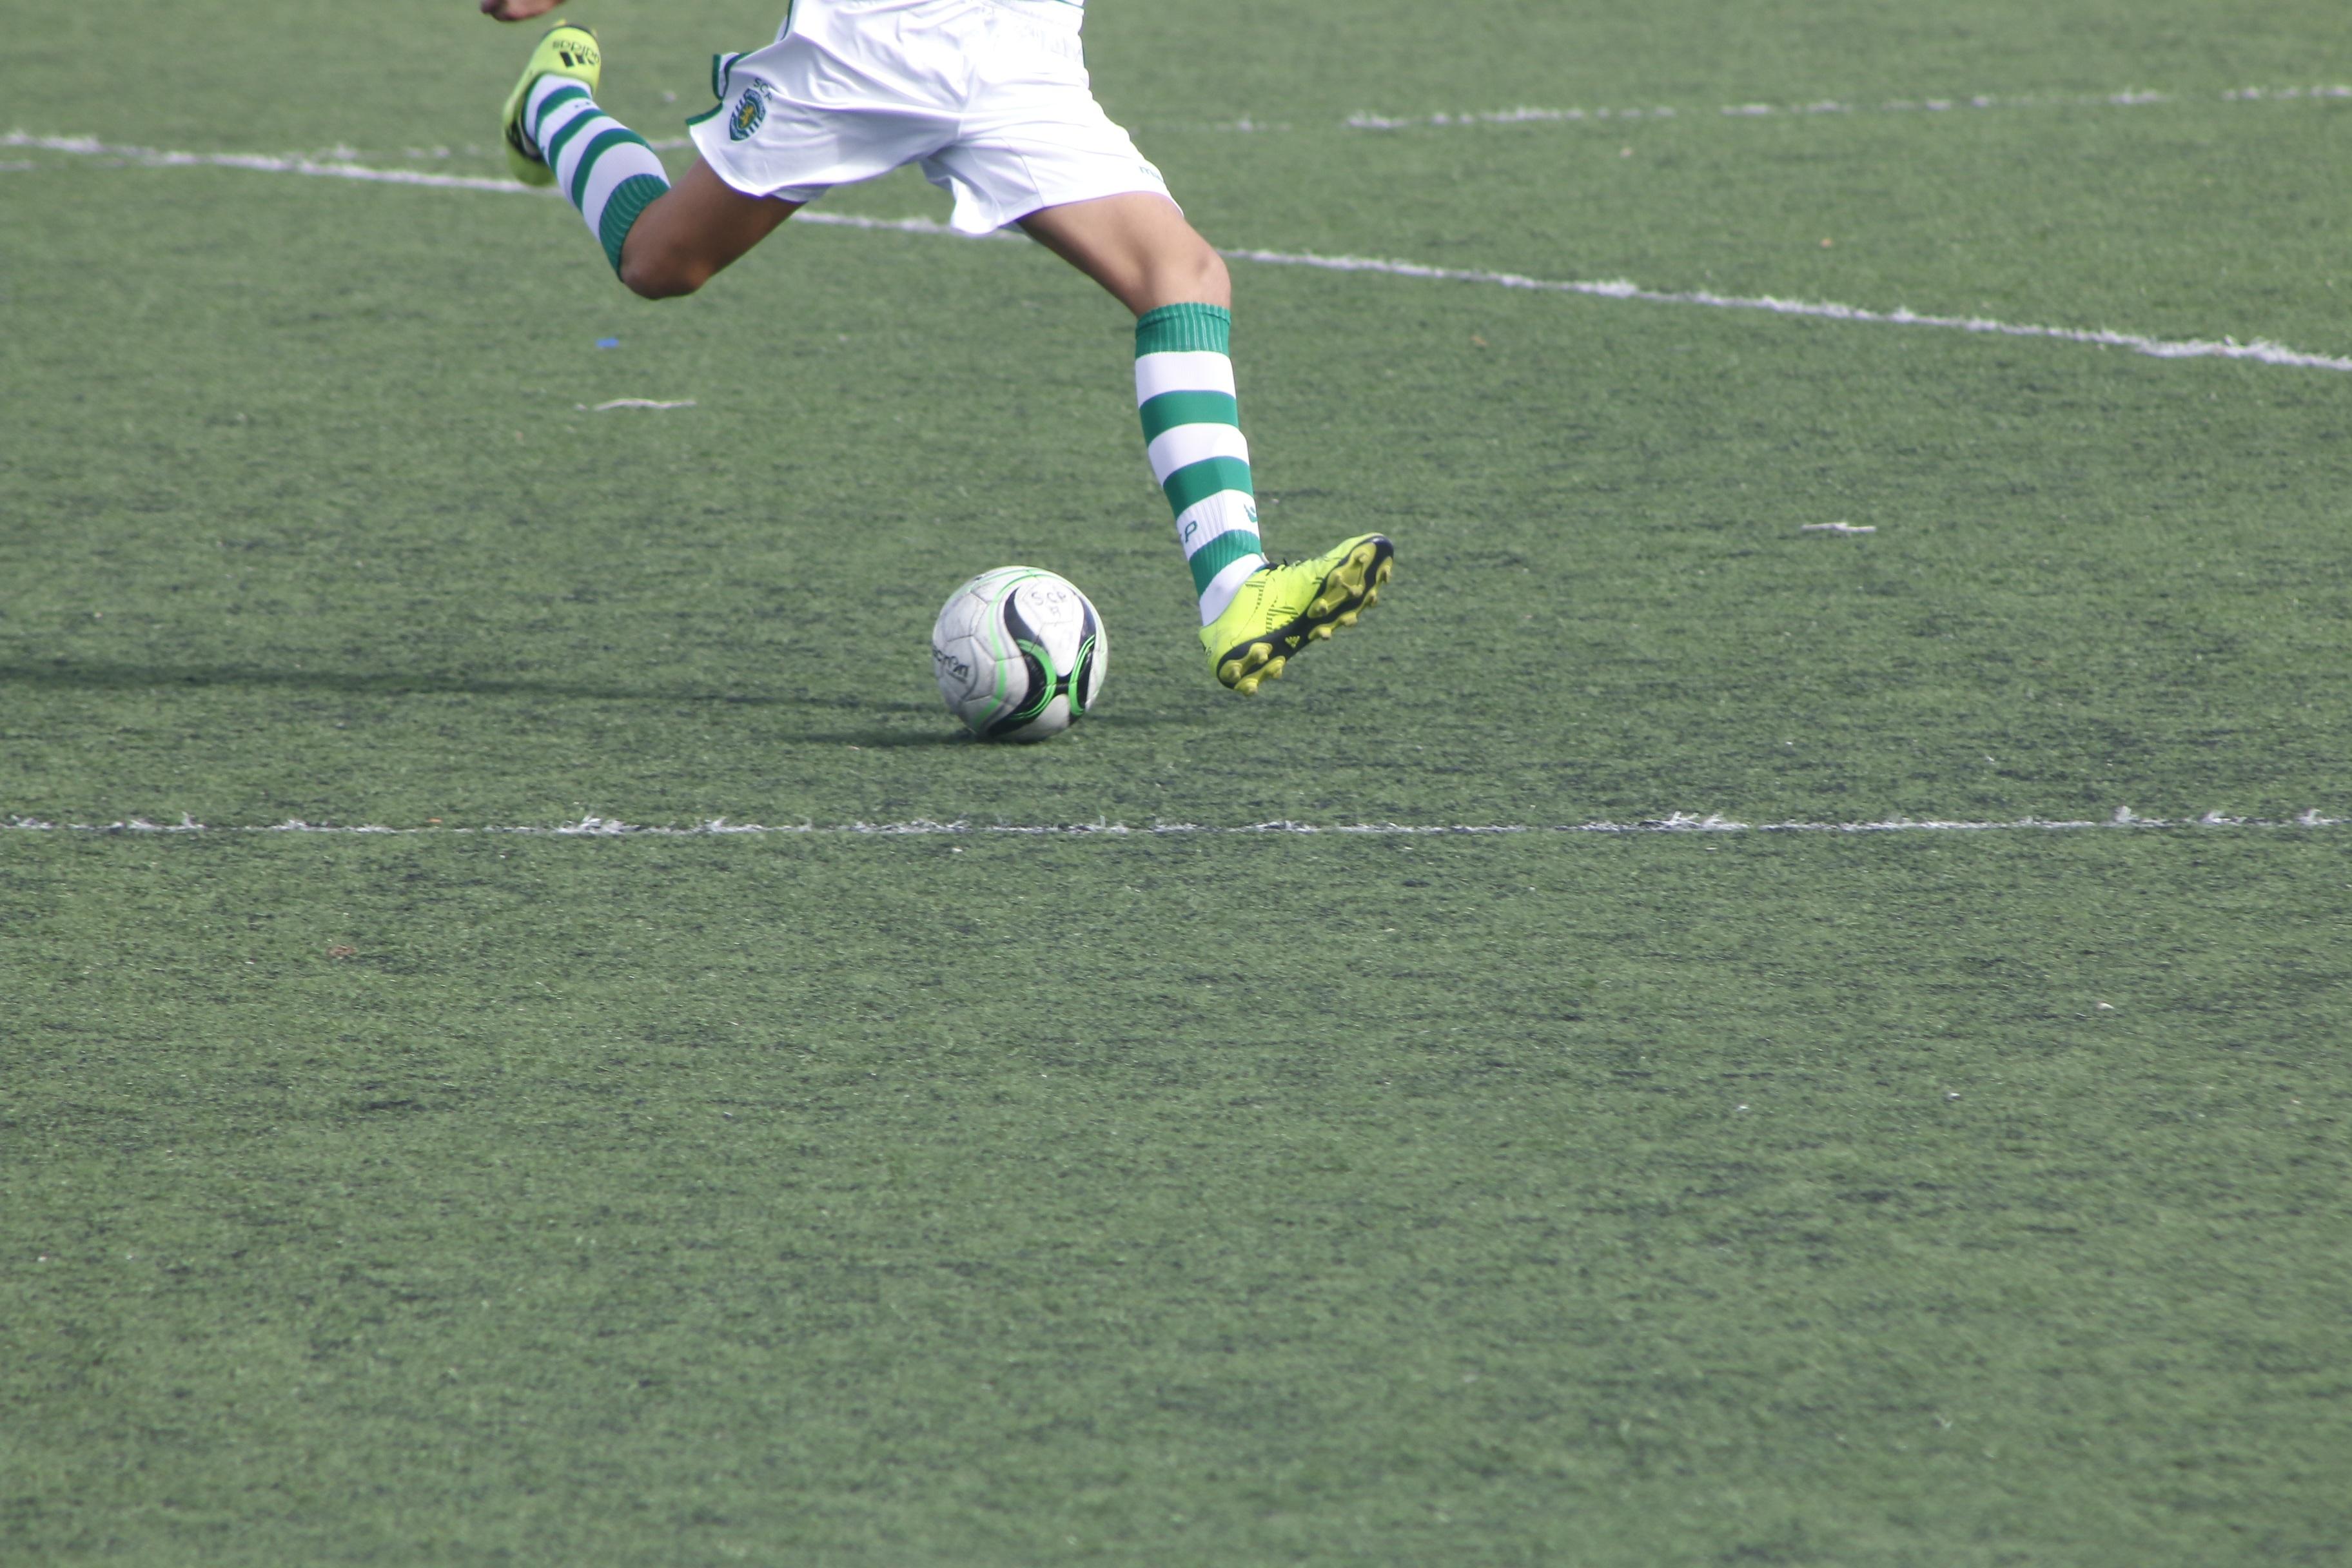 Kostenlose Foto Sport Feld Rasen Spiel Boot Fussball